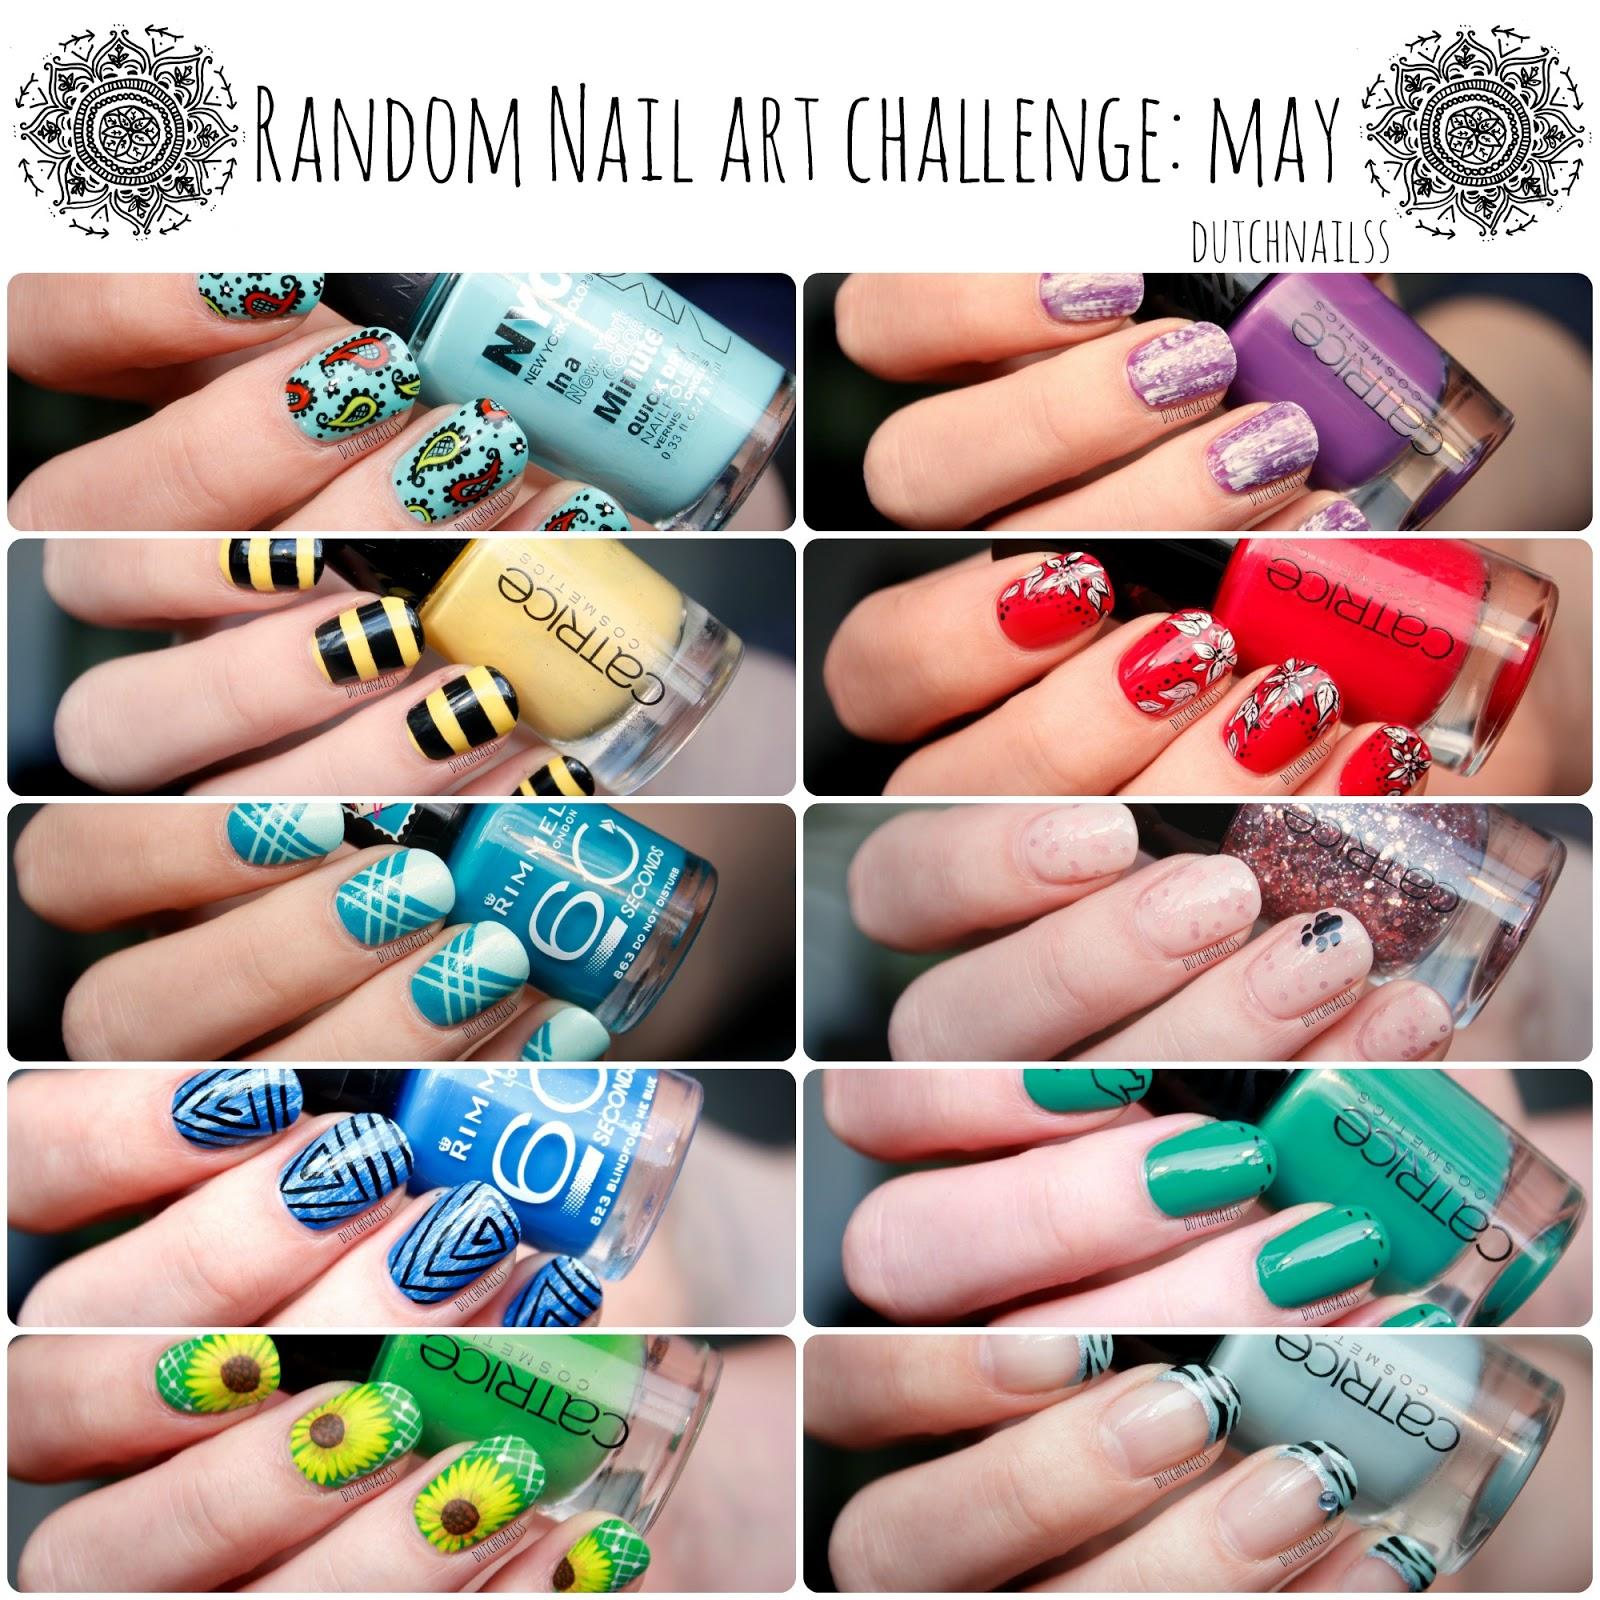 Dutchnailss Random Nail Art Challenge May Completed